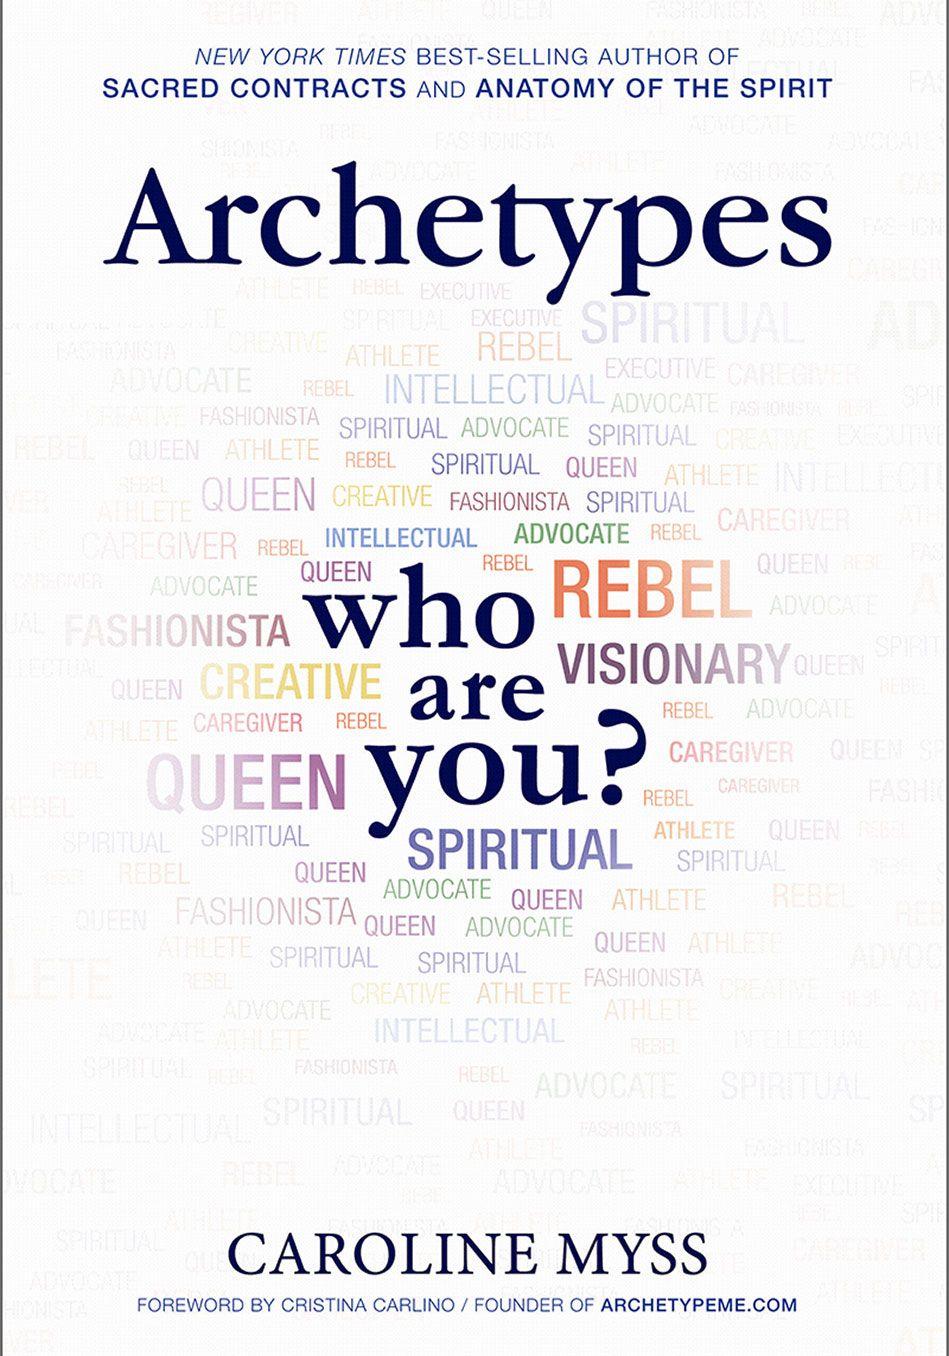 Book Excerpt: Archetypes by Caroline Myss | BOOKS TO READ ...